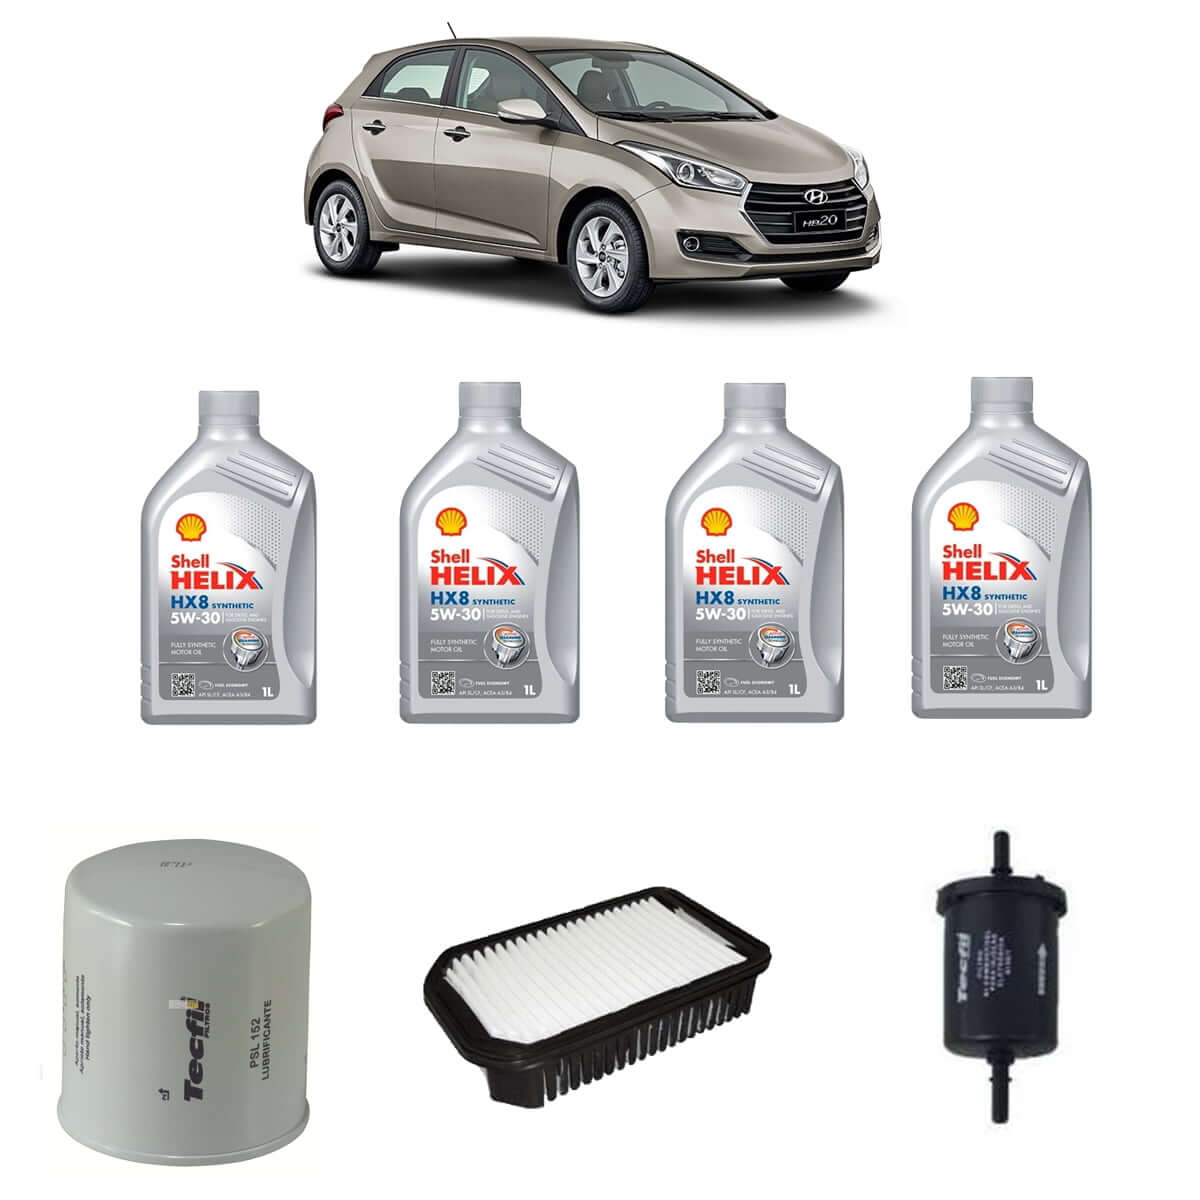 Kit Econômico Troca de Óleo Hyundai Hb20 1.6 Óleo Shell 5w30 Sintético em até 6x sem juros